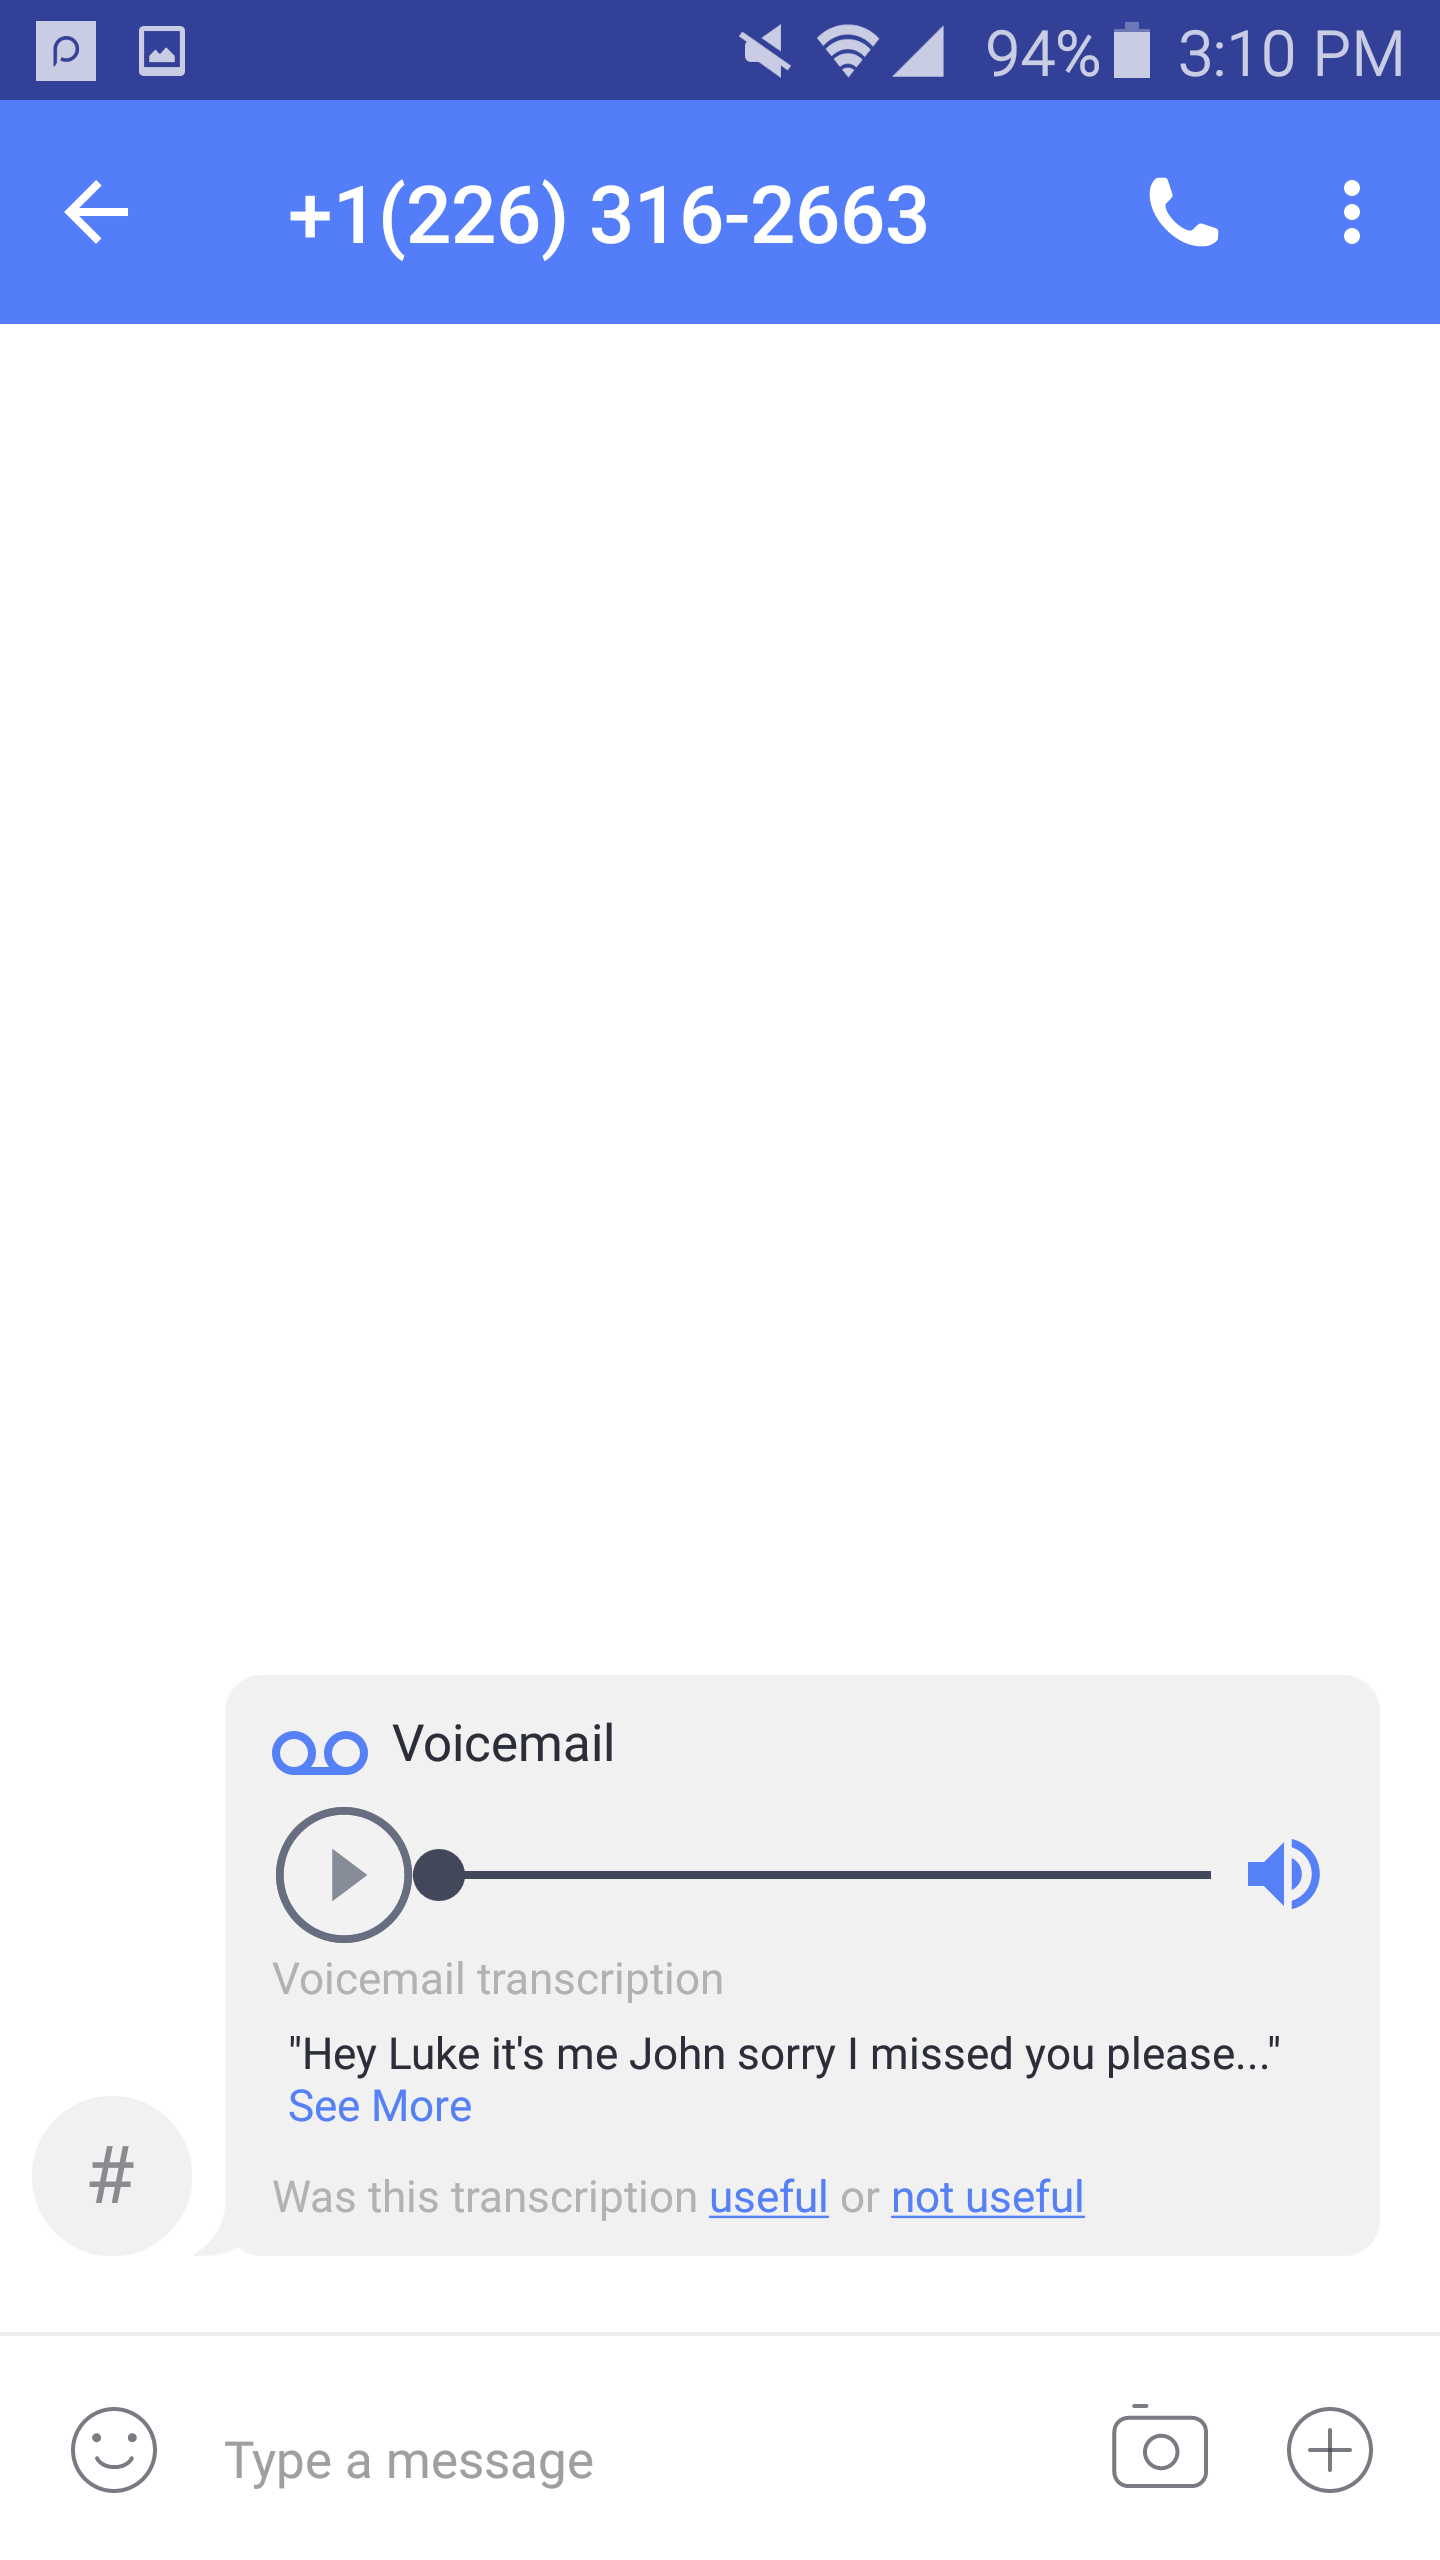 Premium Feature Voicemail Transcriptions Textnow Support